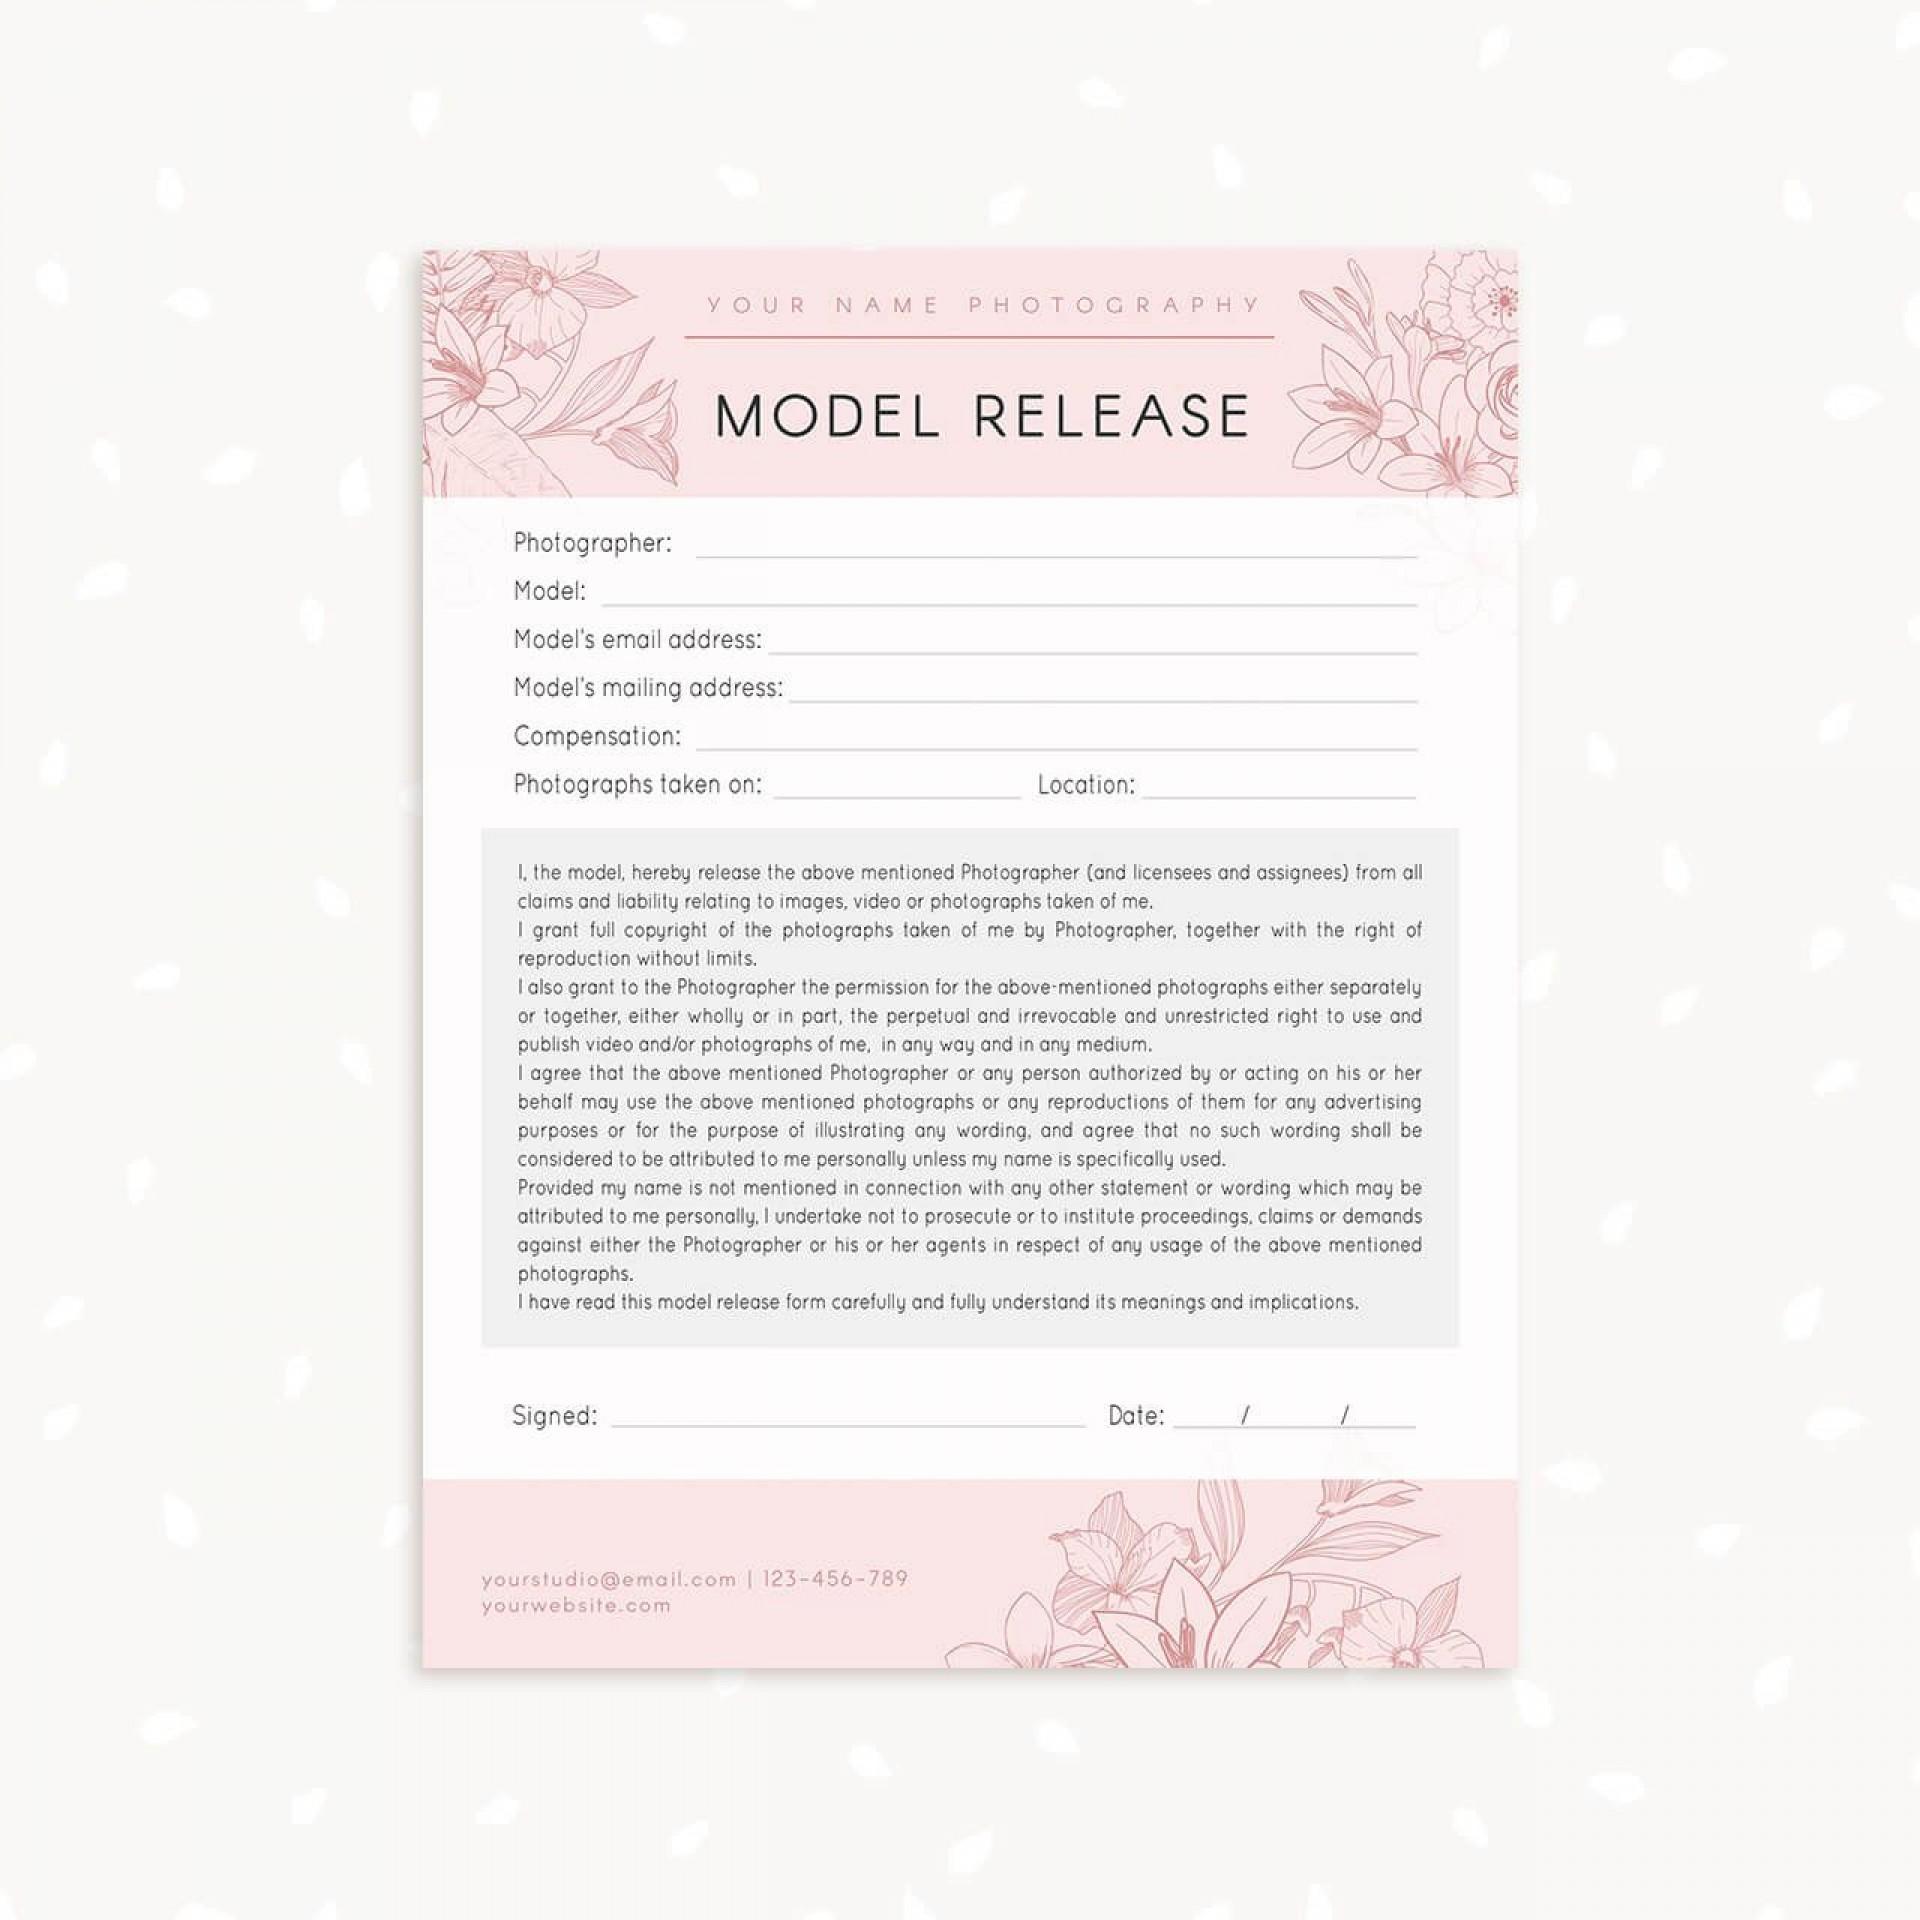 006 Marvelou Model Release Form Template Highest Clarity  Photography Uk Gdpr Australia1920